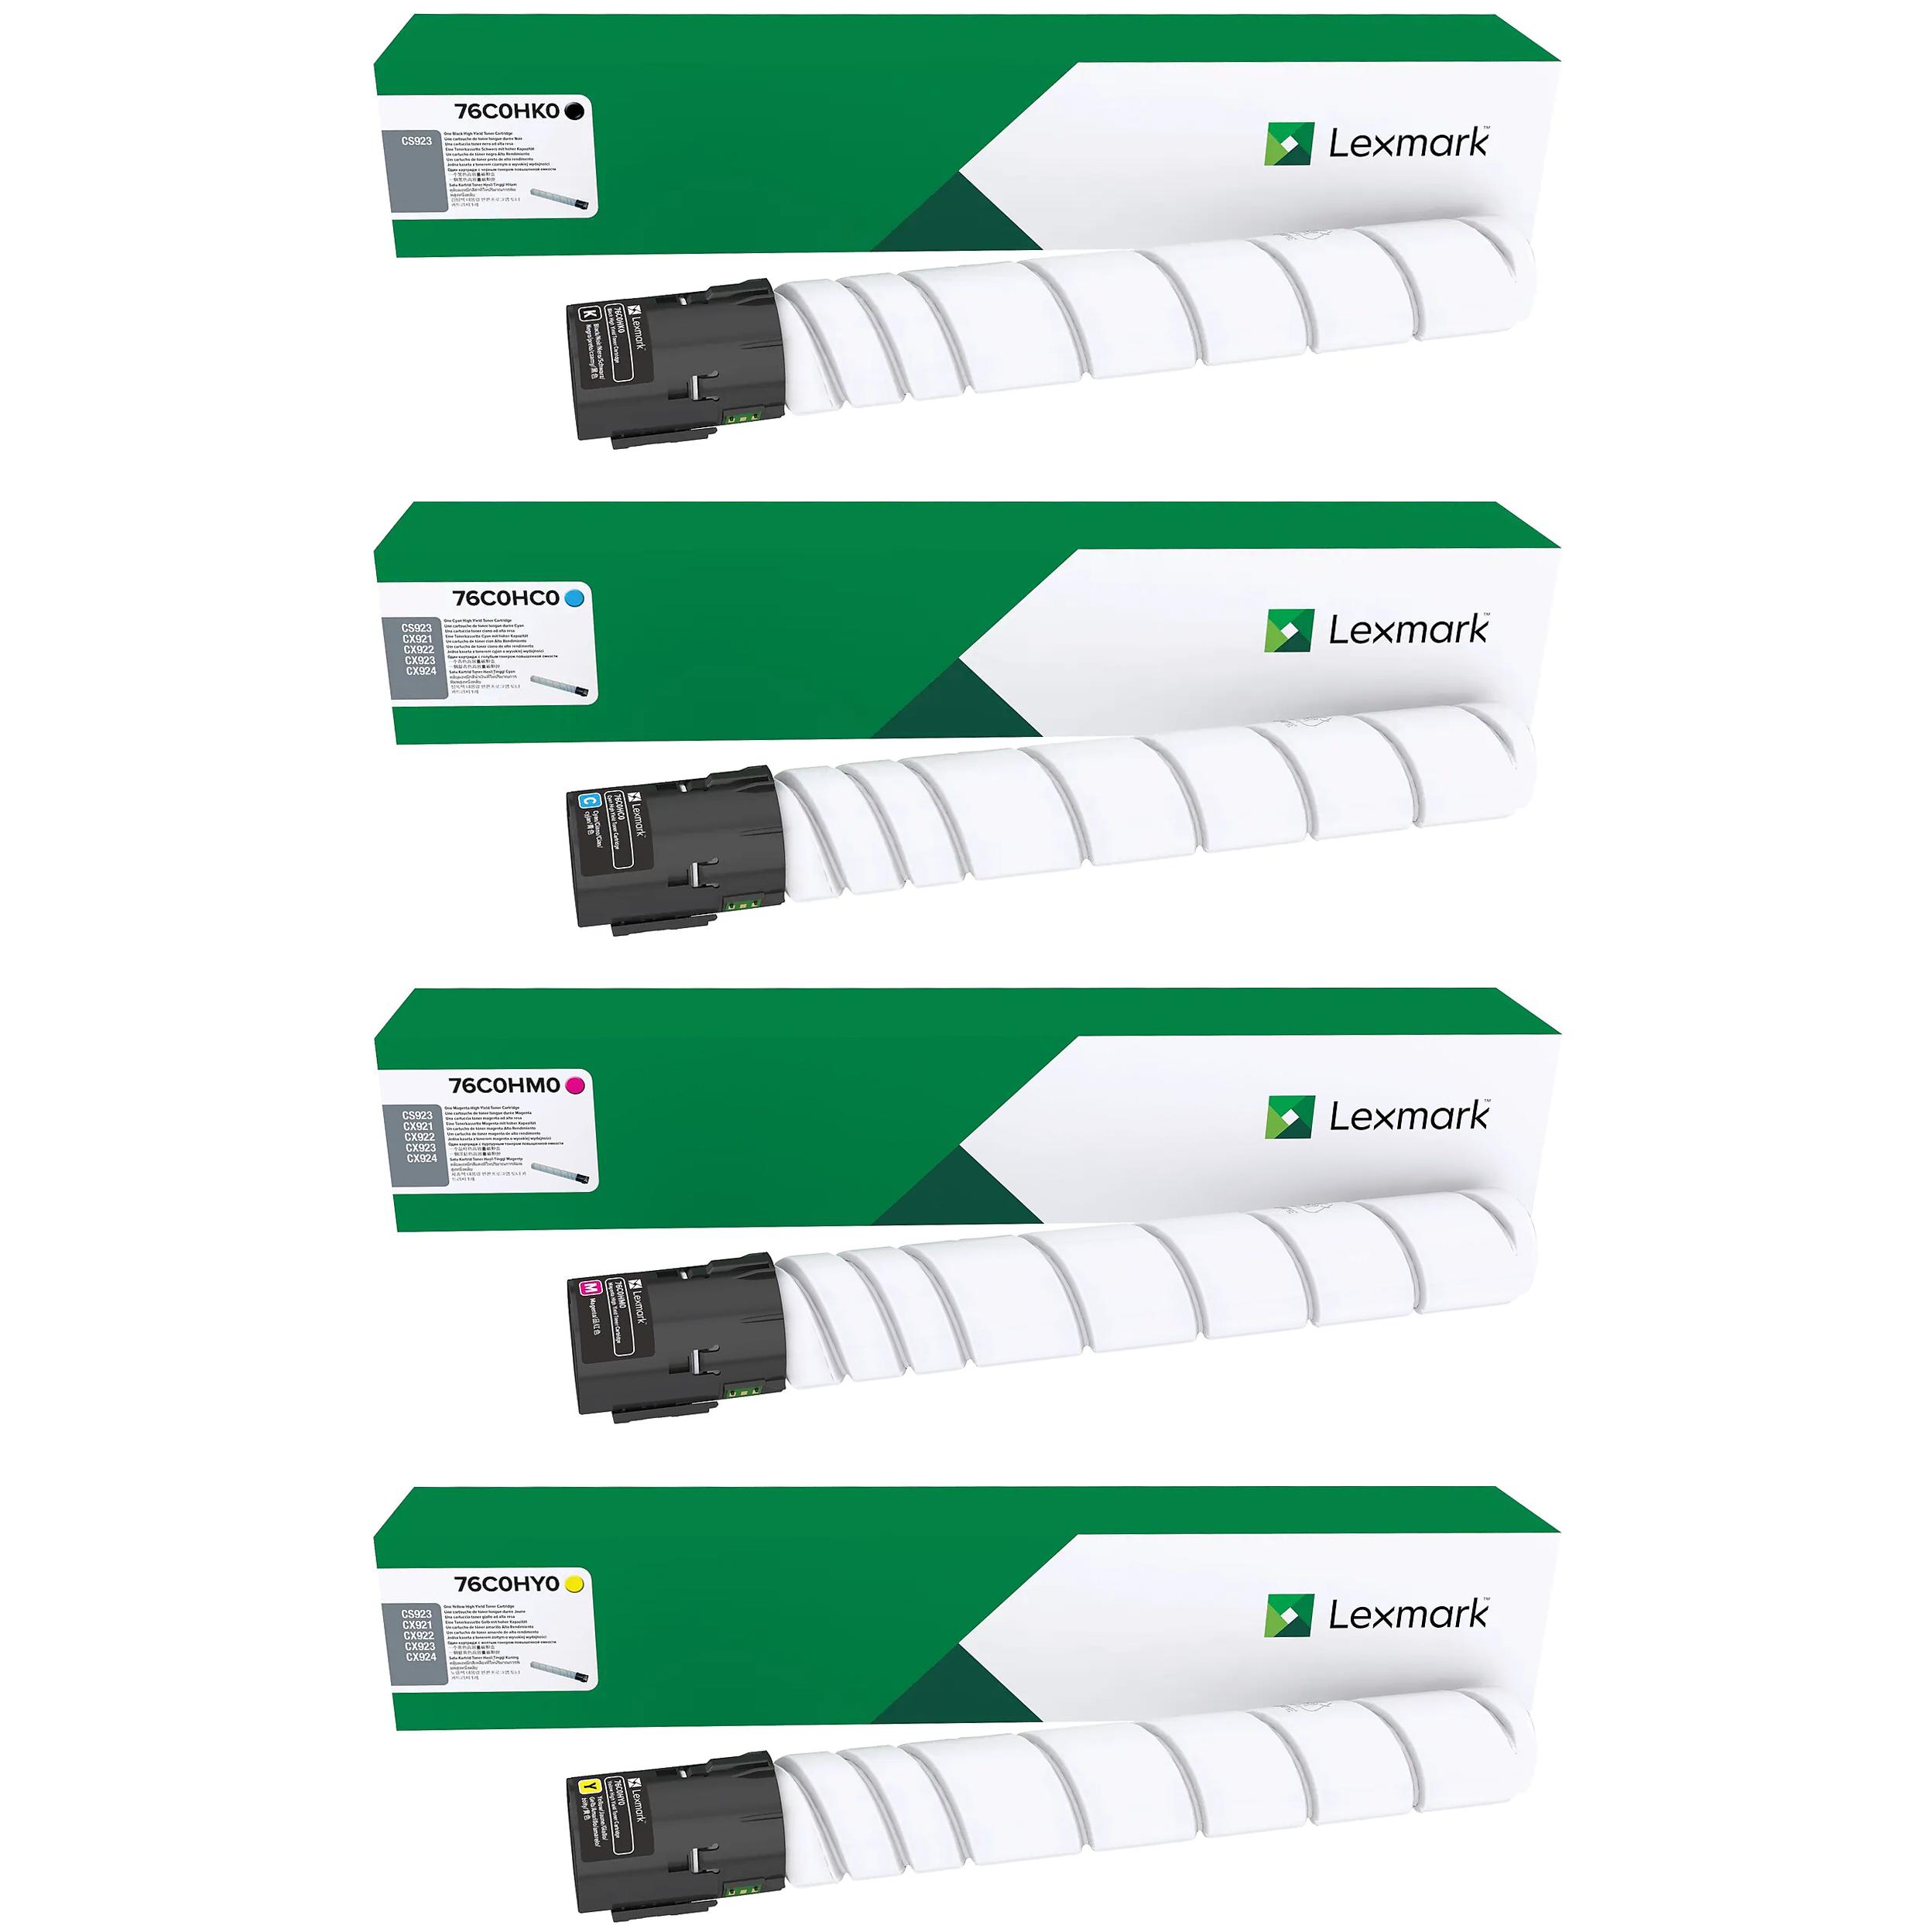 Lexmark CS923 Set | 76C0HC0 76C0HK0 76C0HM0 76C0HY0 | Original Lexmark Toner Cartridges – Black, Cyan, Magenta, Yellow